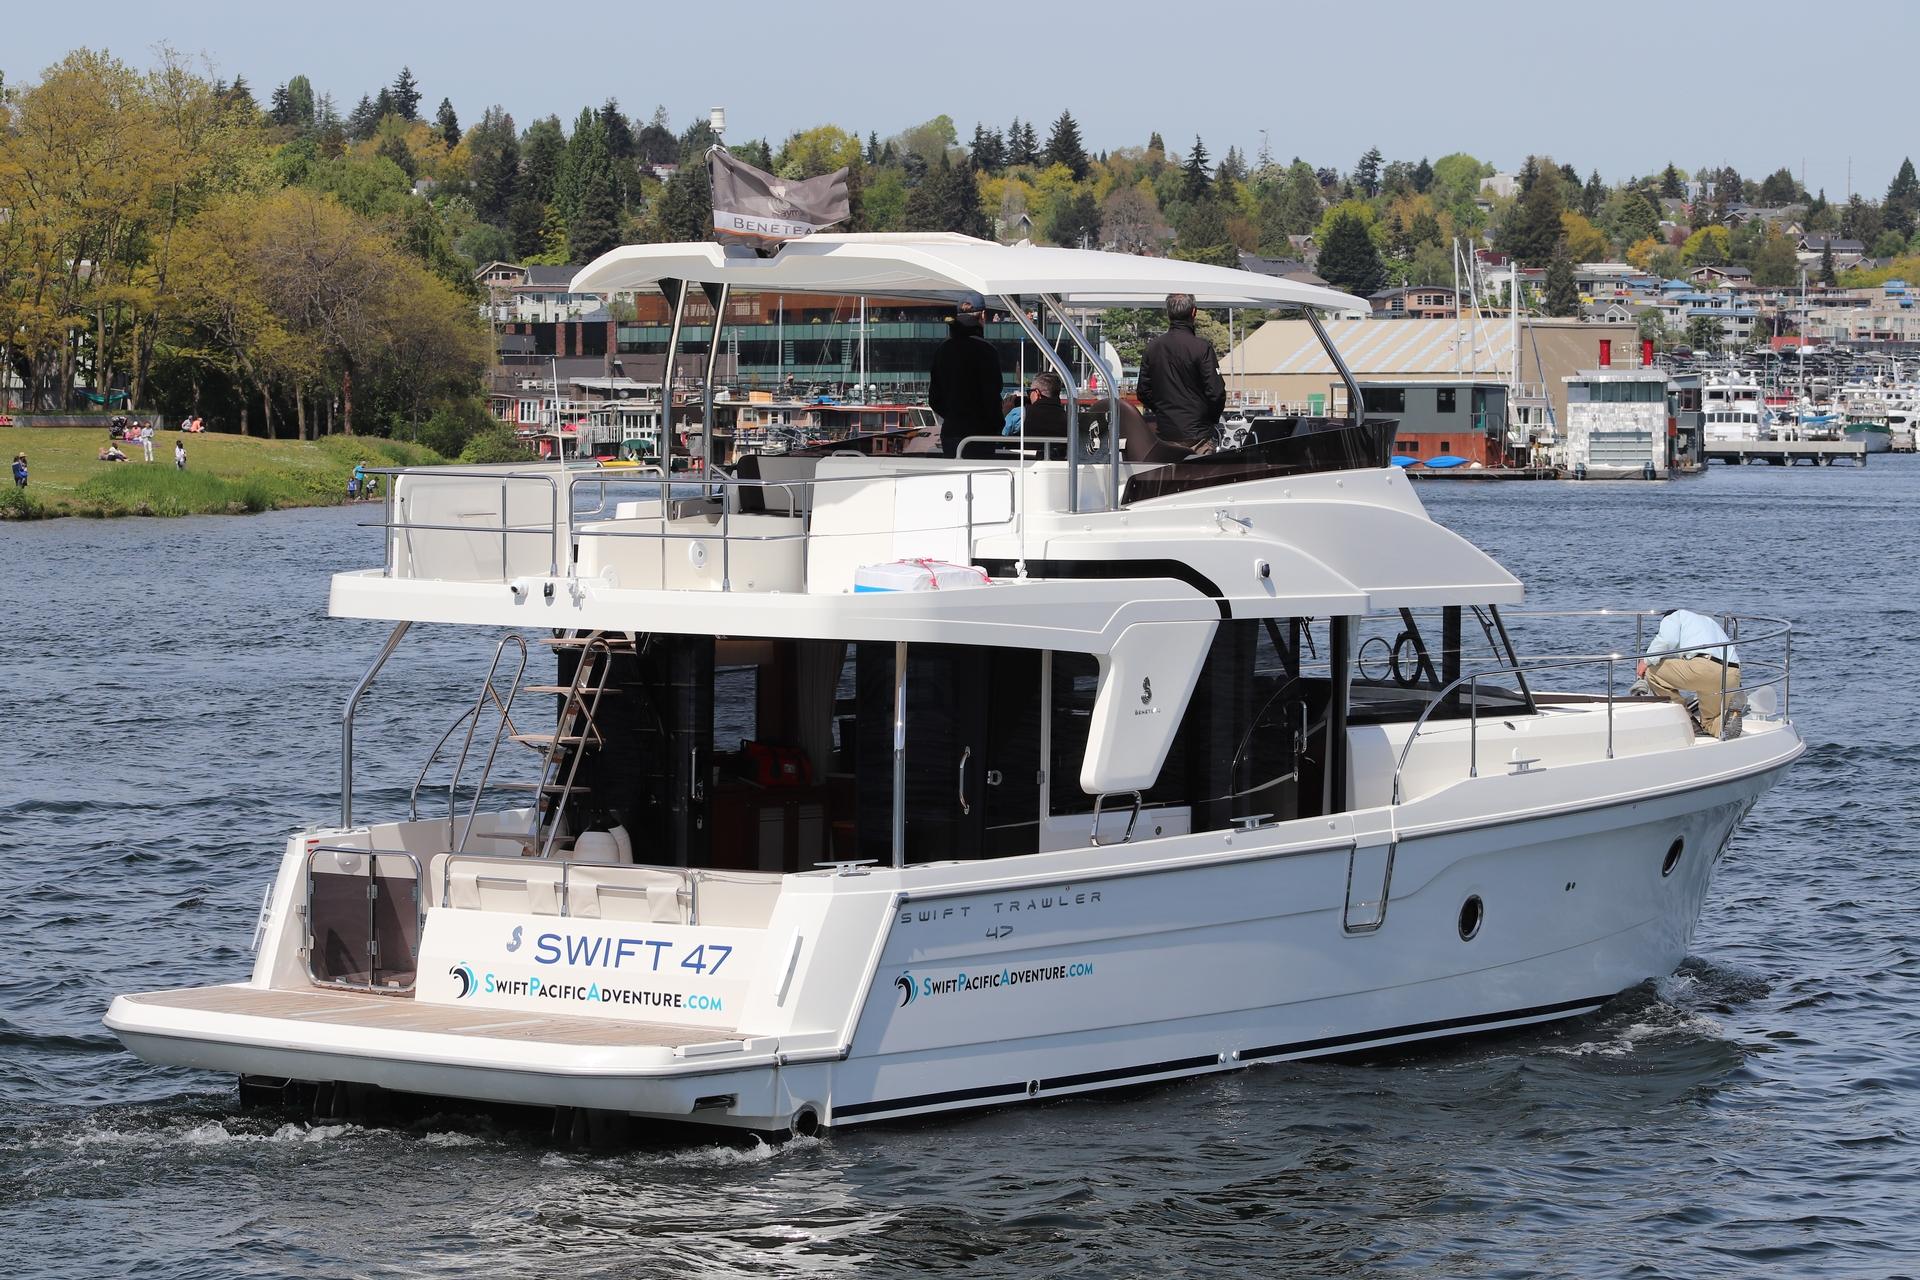 Beneteau Swift Pacific Adventure | The Boat